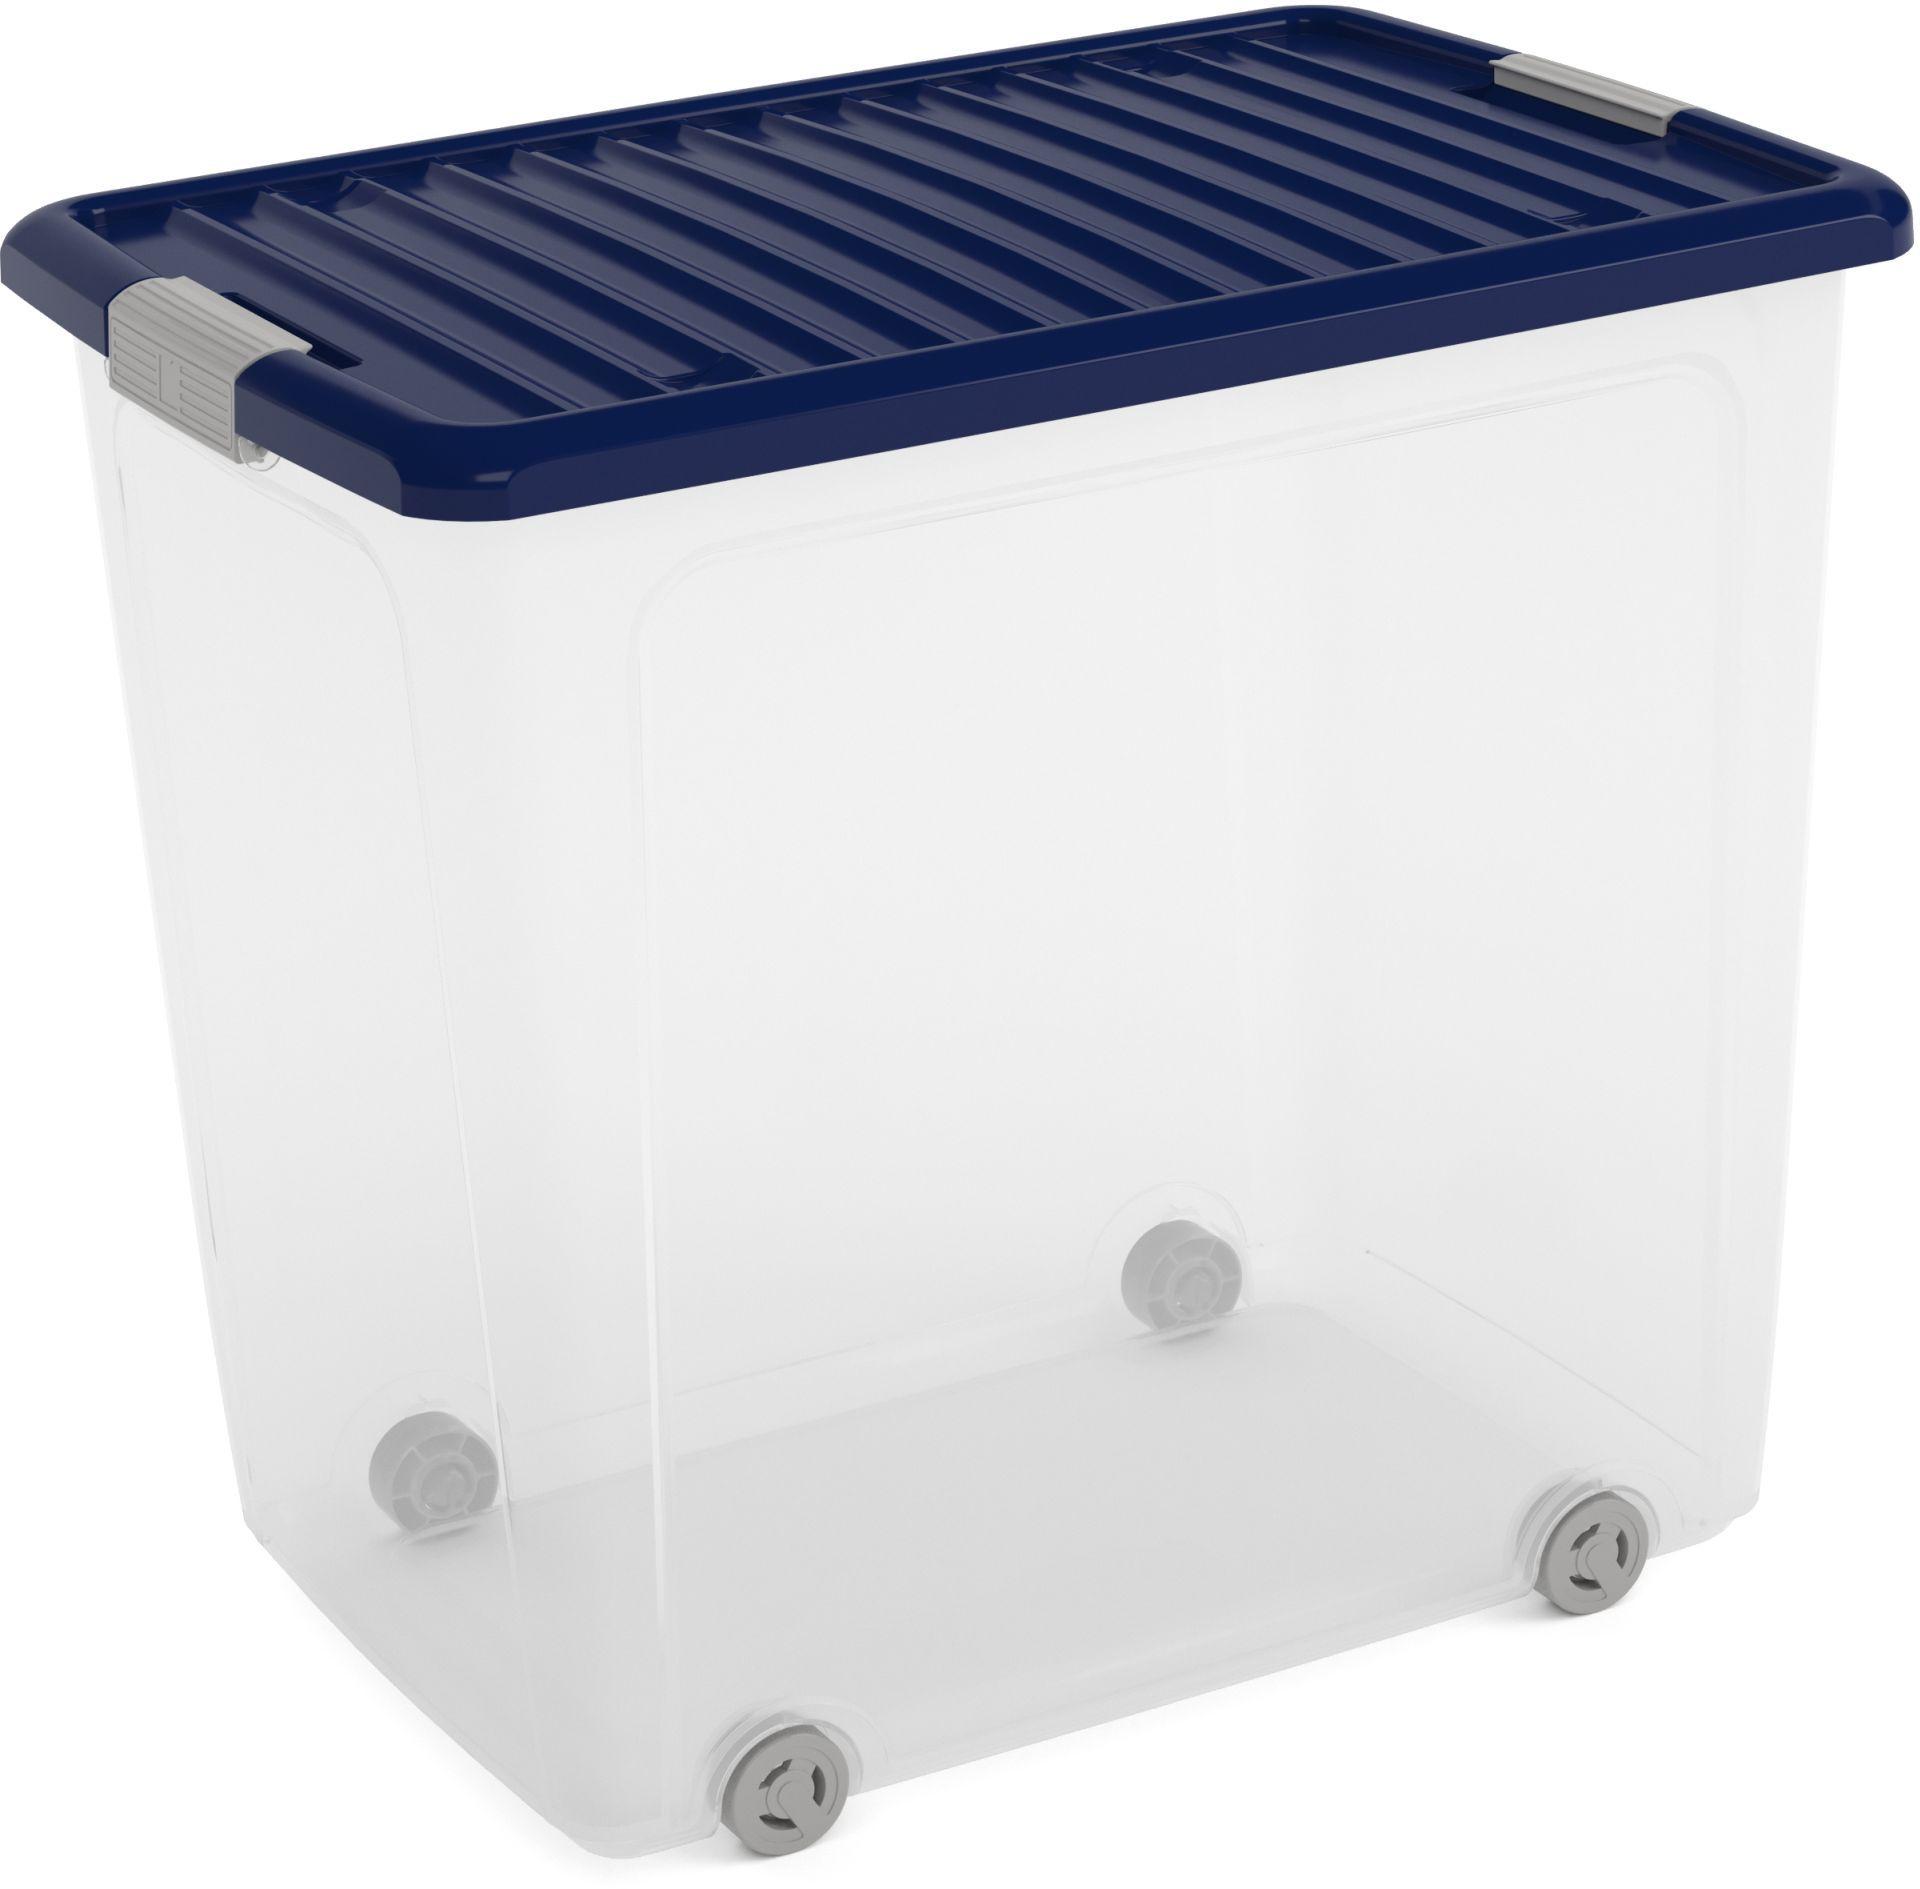 KIS W BOX XL 78L 57x39x52cm transparent/modrá indigo